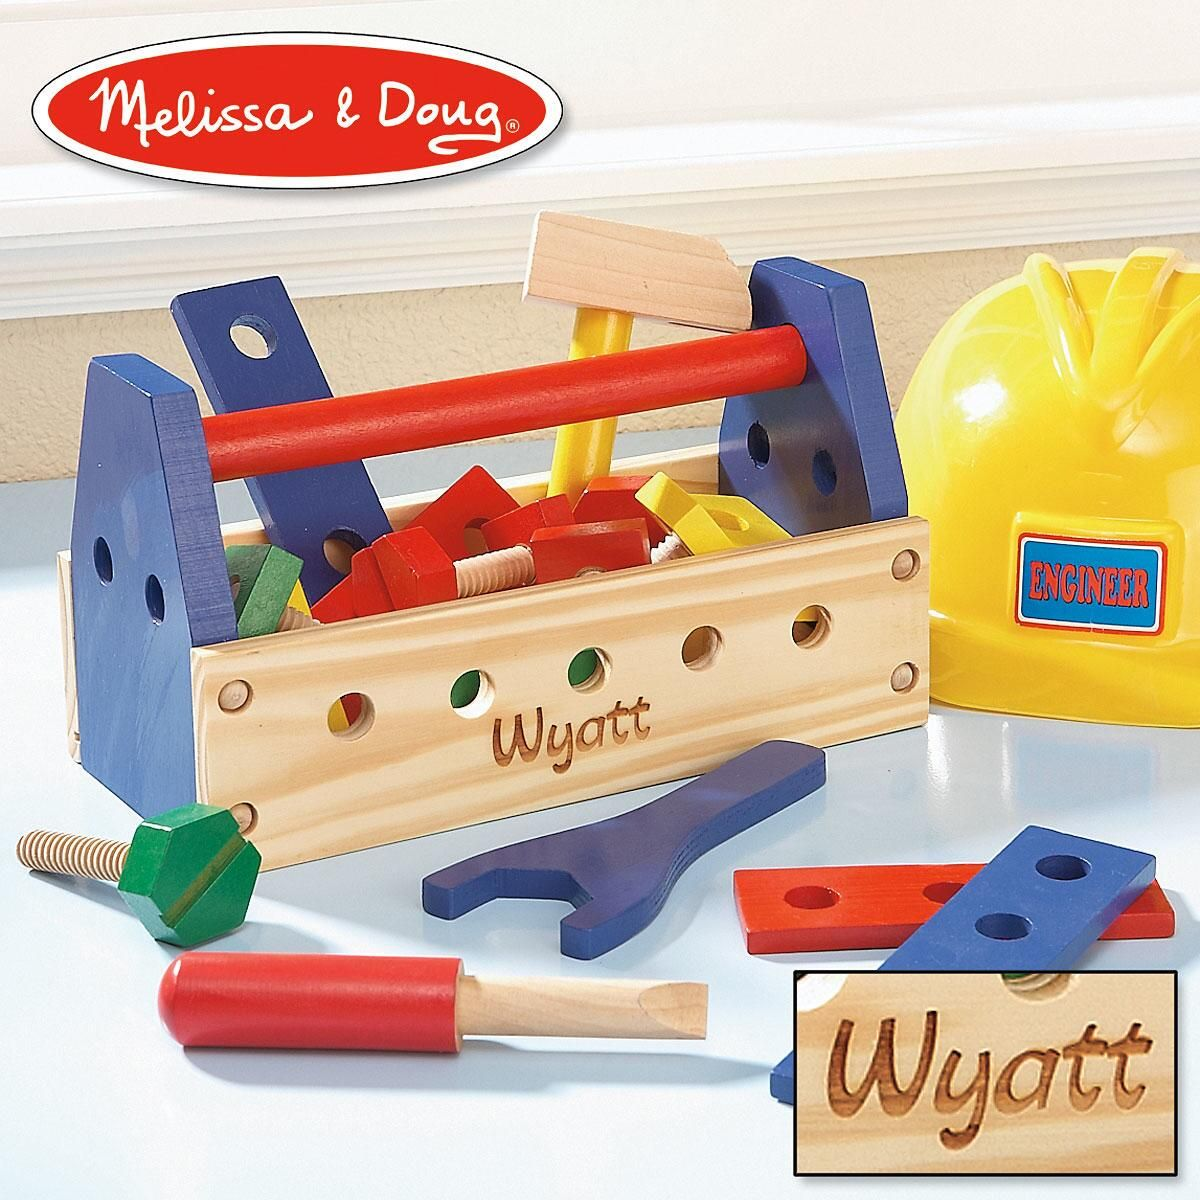 Melissa & Doug® Wooden Tool Kit